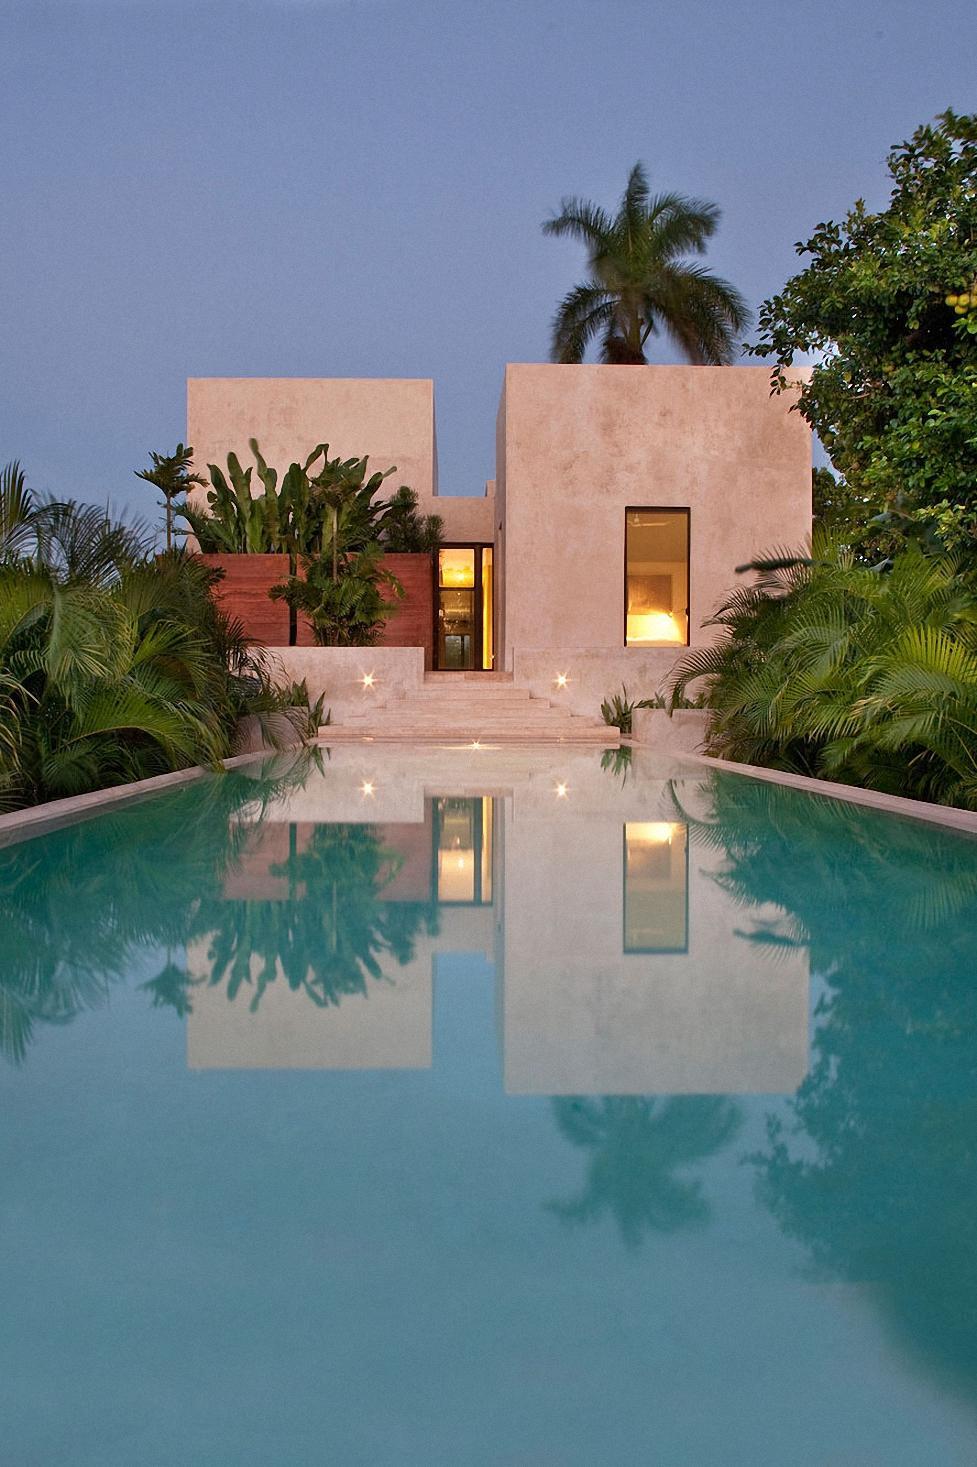 house luxury swimming pool reflection palms